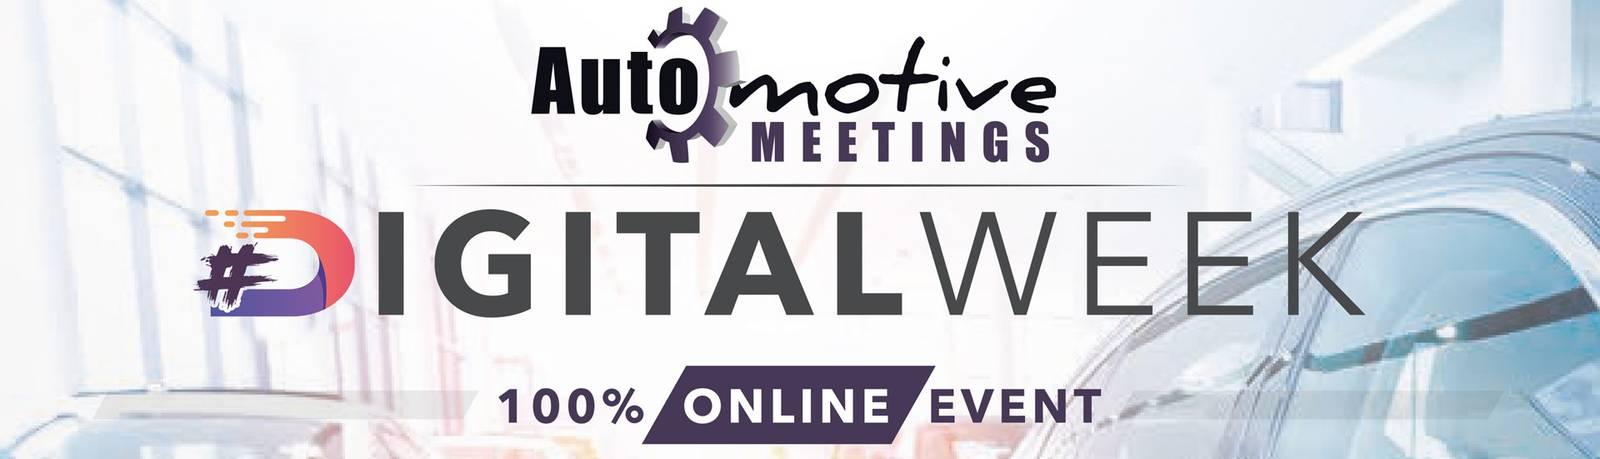 Automotive application at the Digital Automotive Meetings 2021